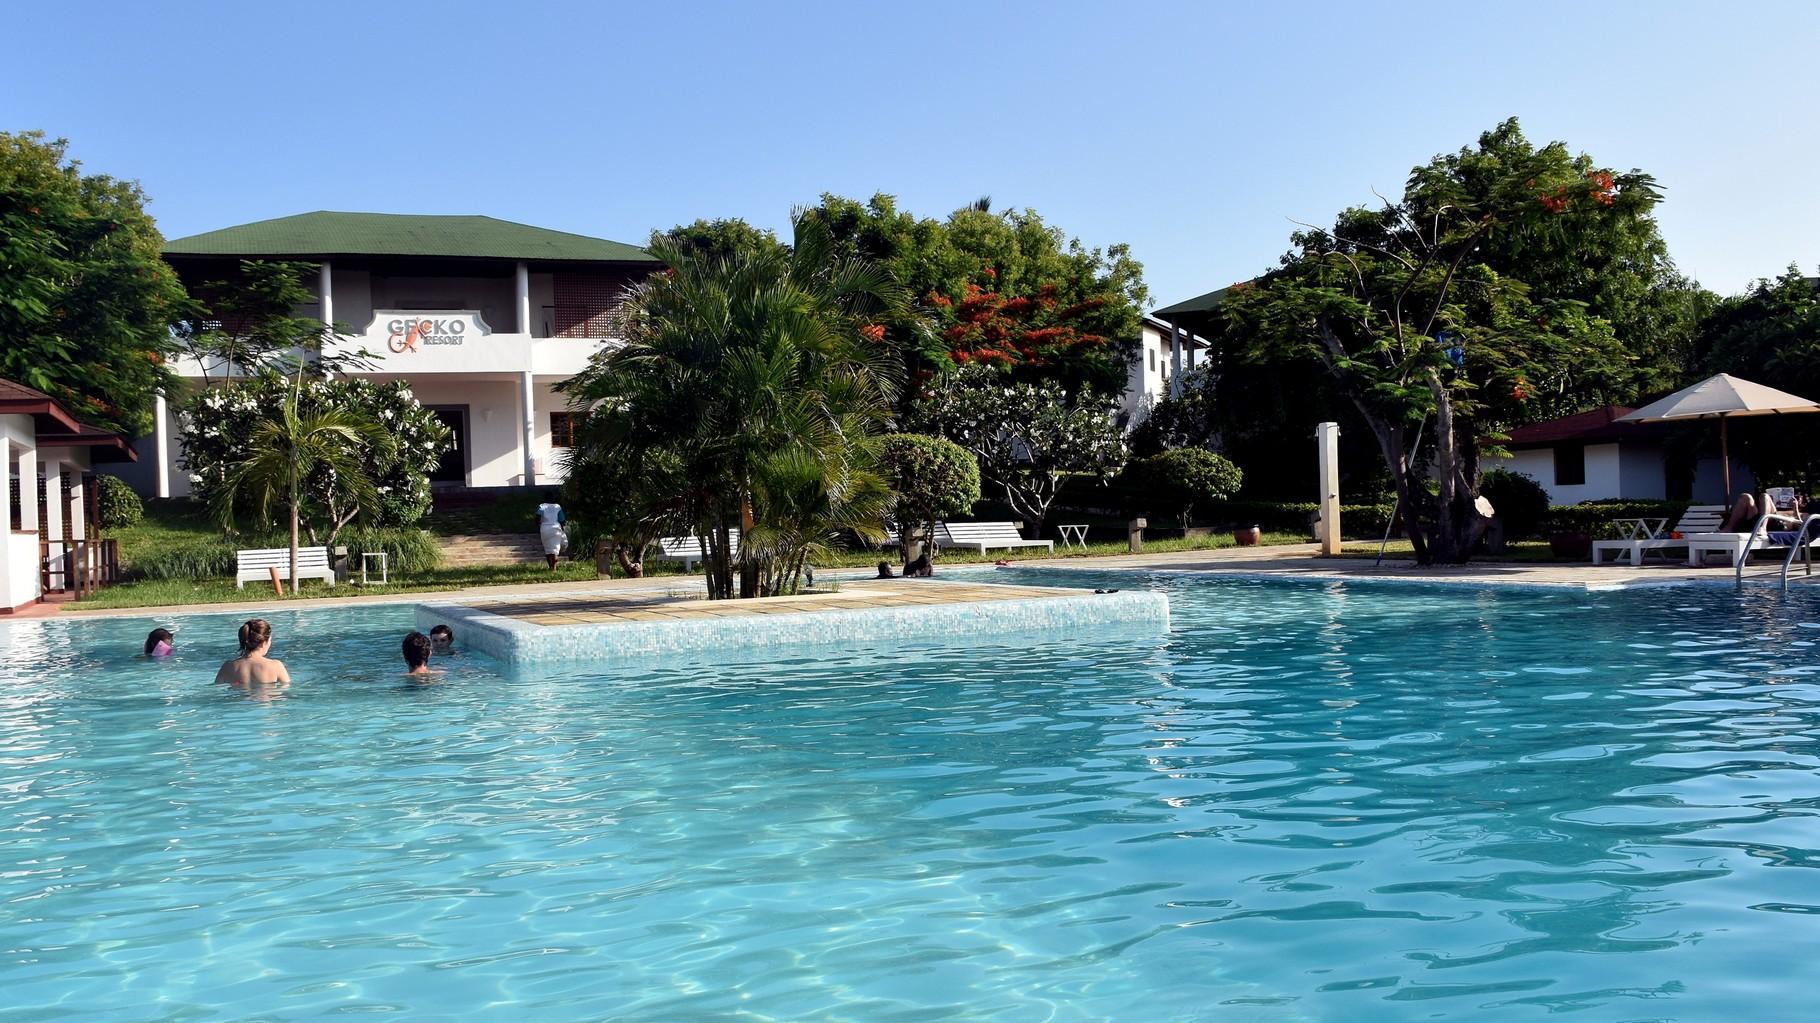 Kenya Vacanze - Gecko Resort, Watamu